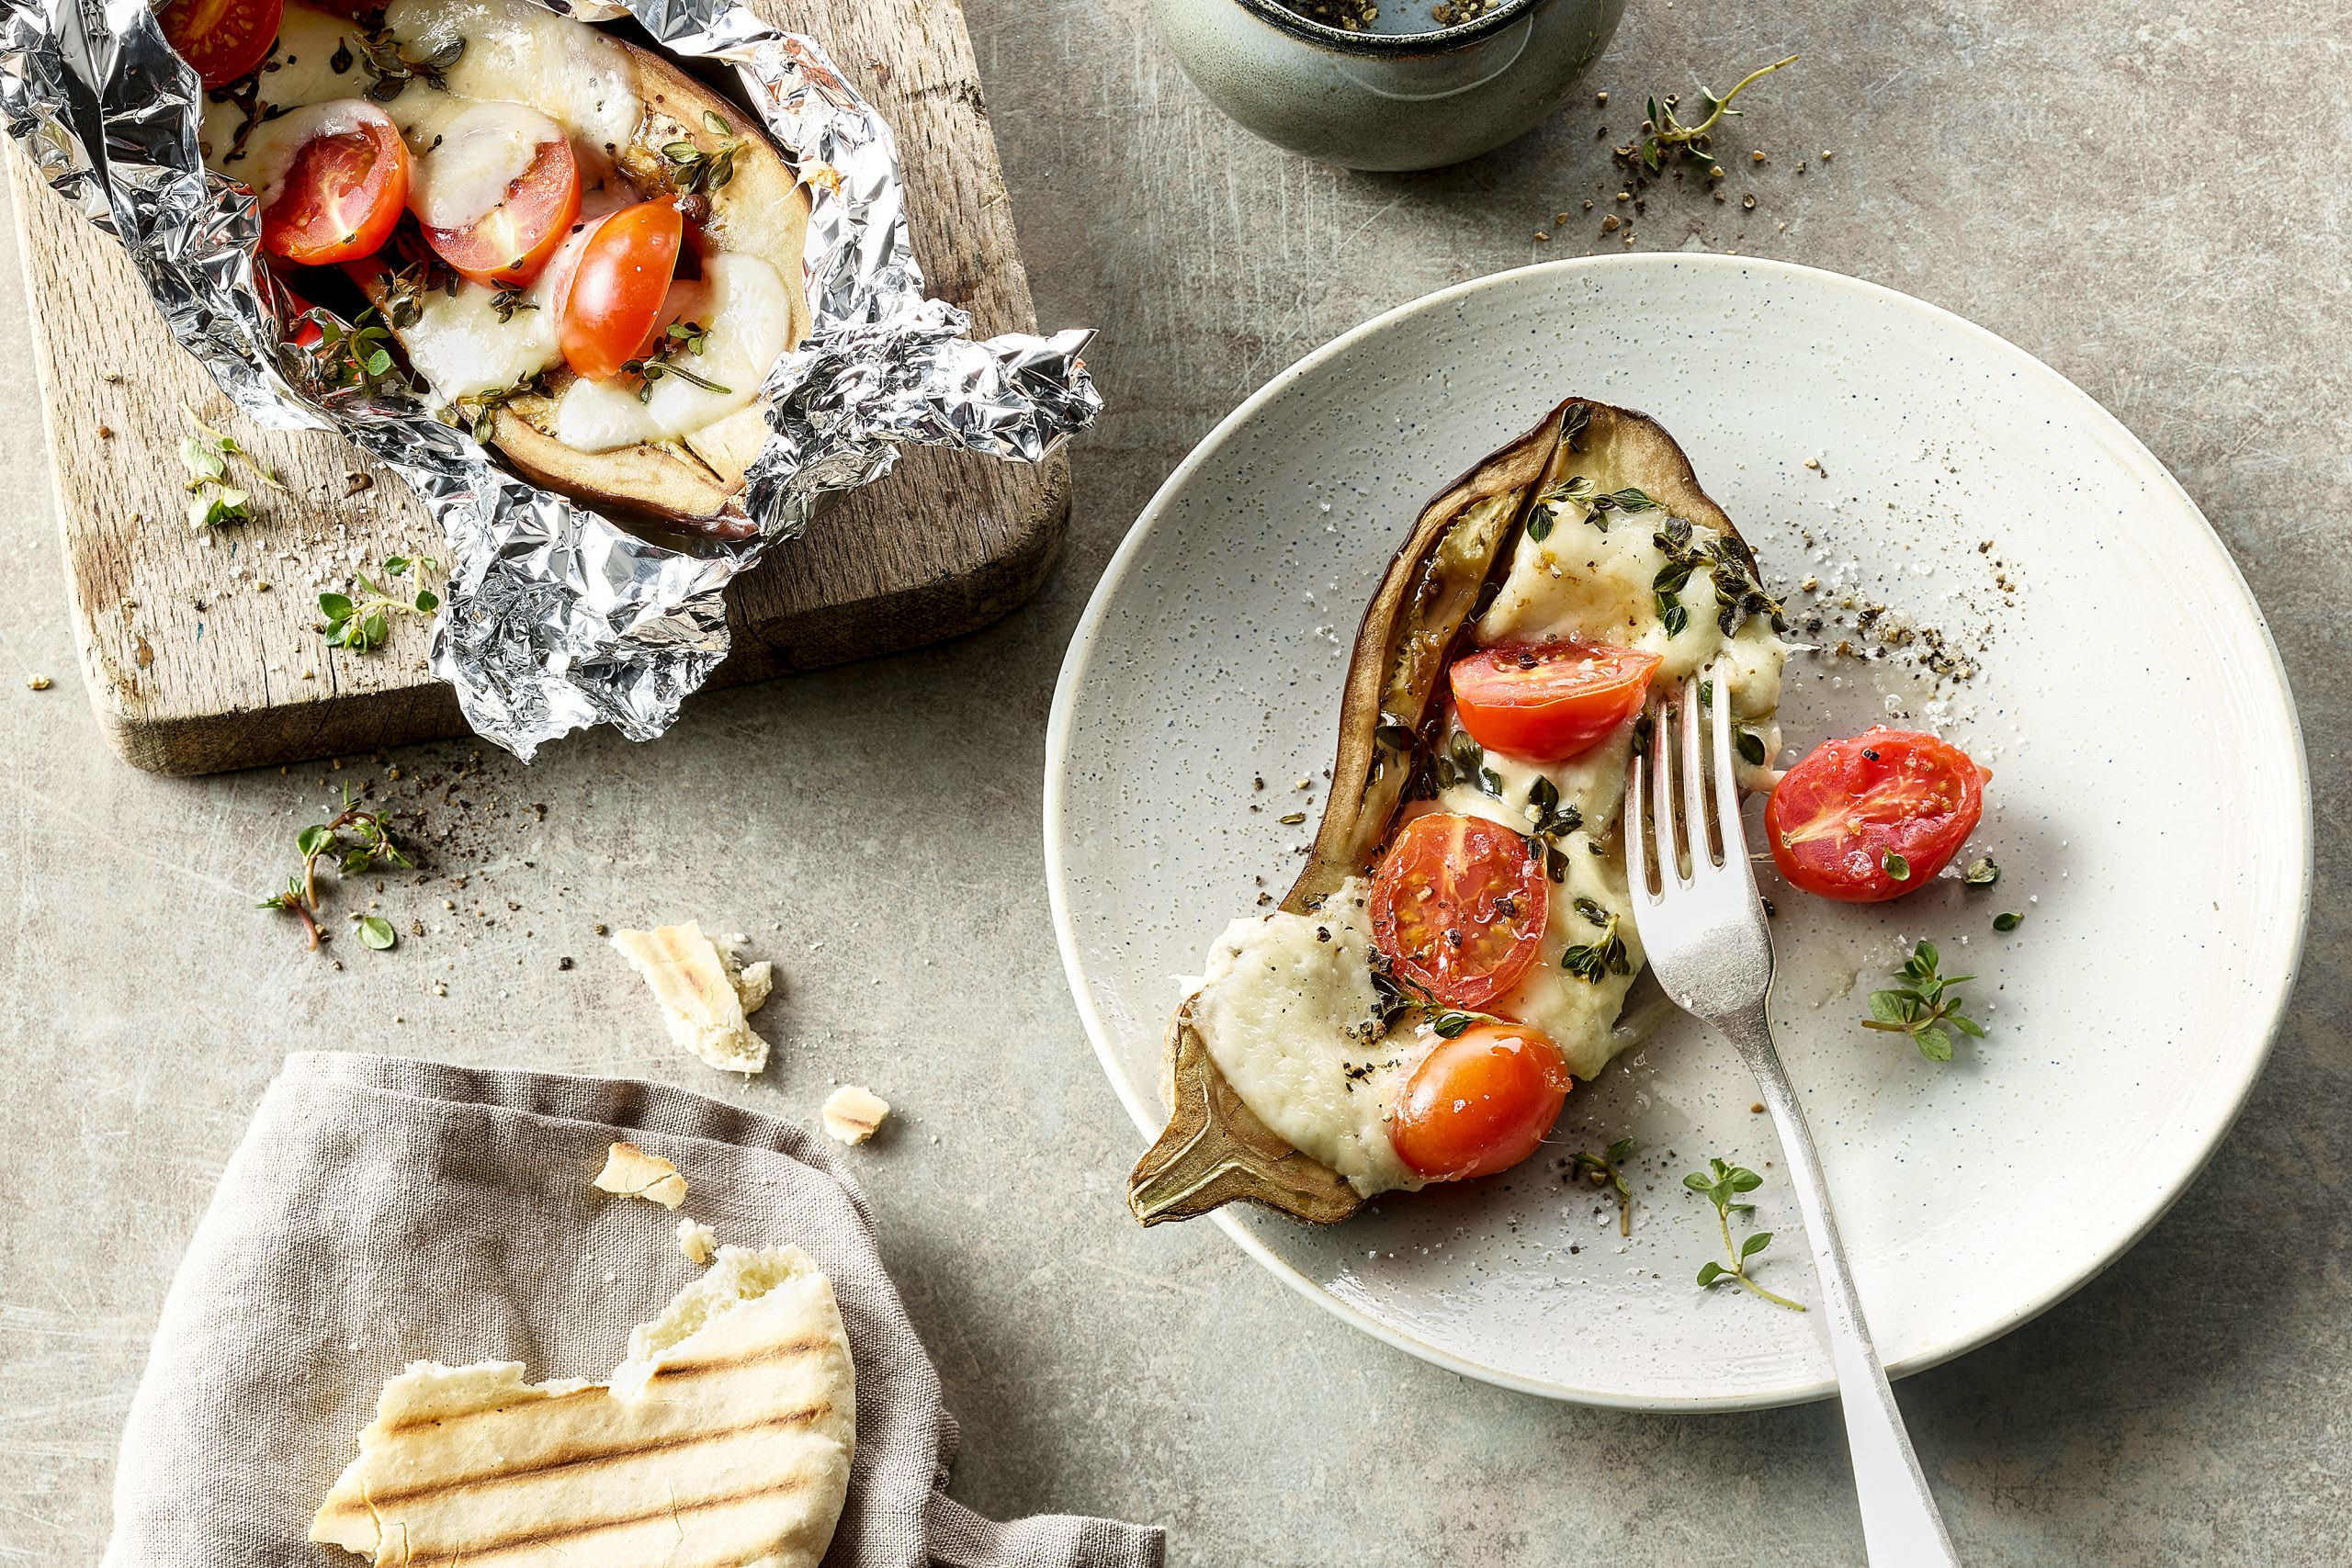 Aubergine farcie aux tomates et à la mozzarella au barbecue